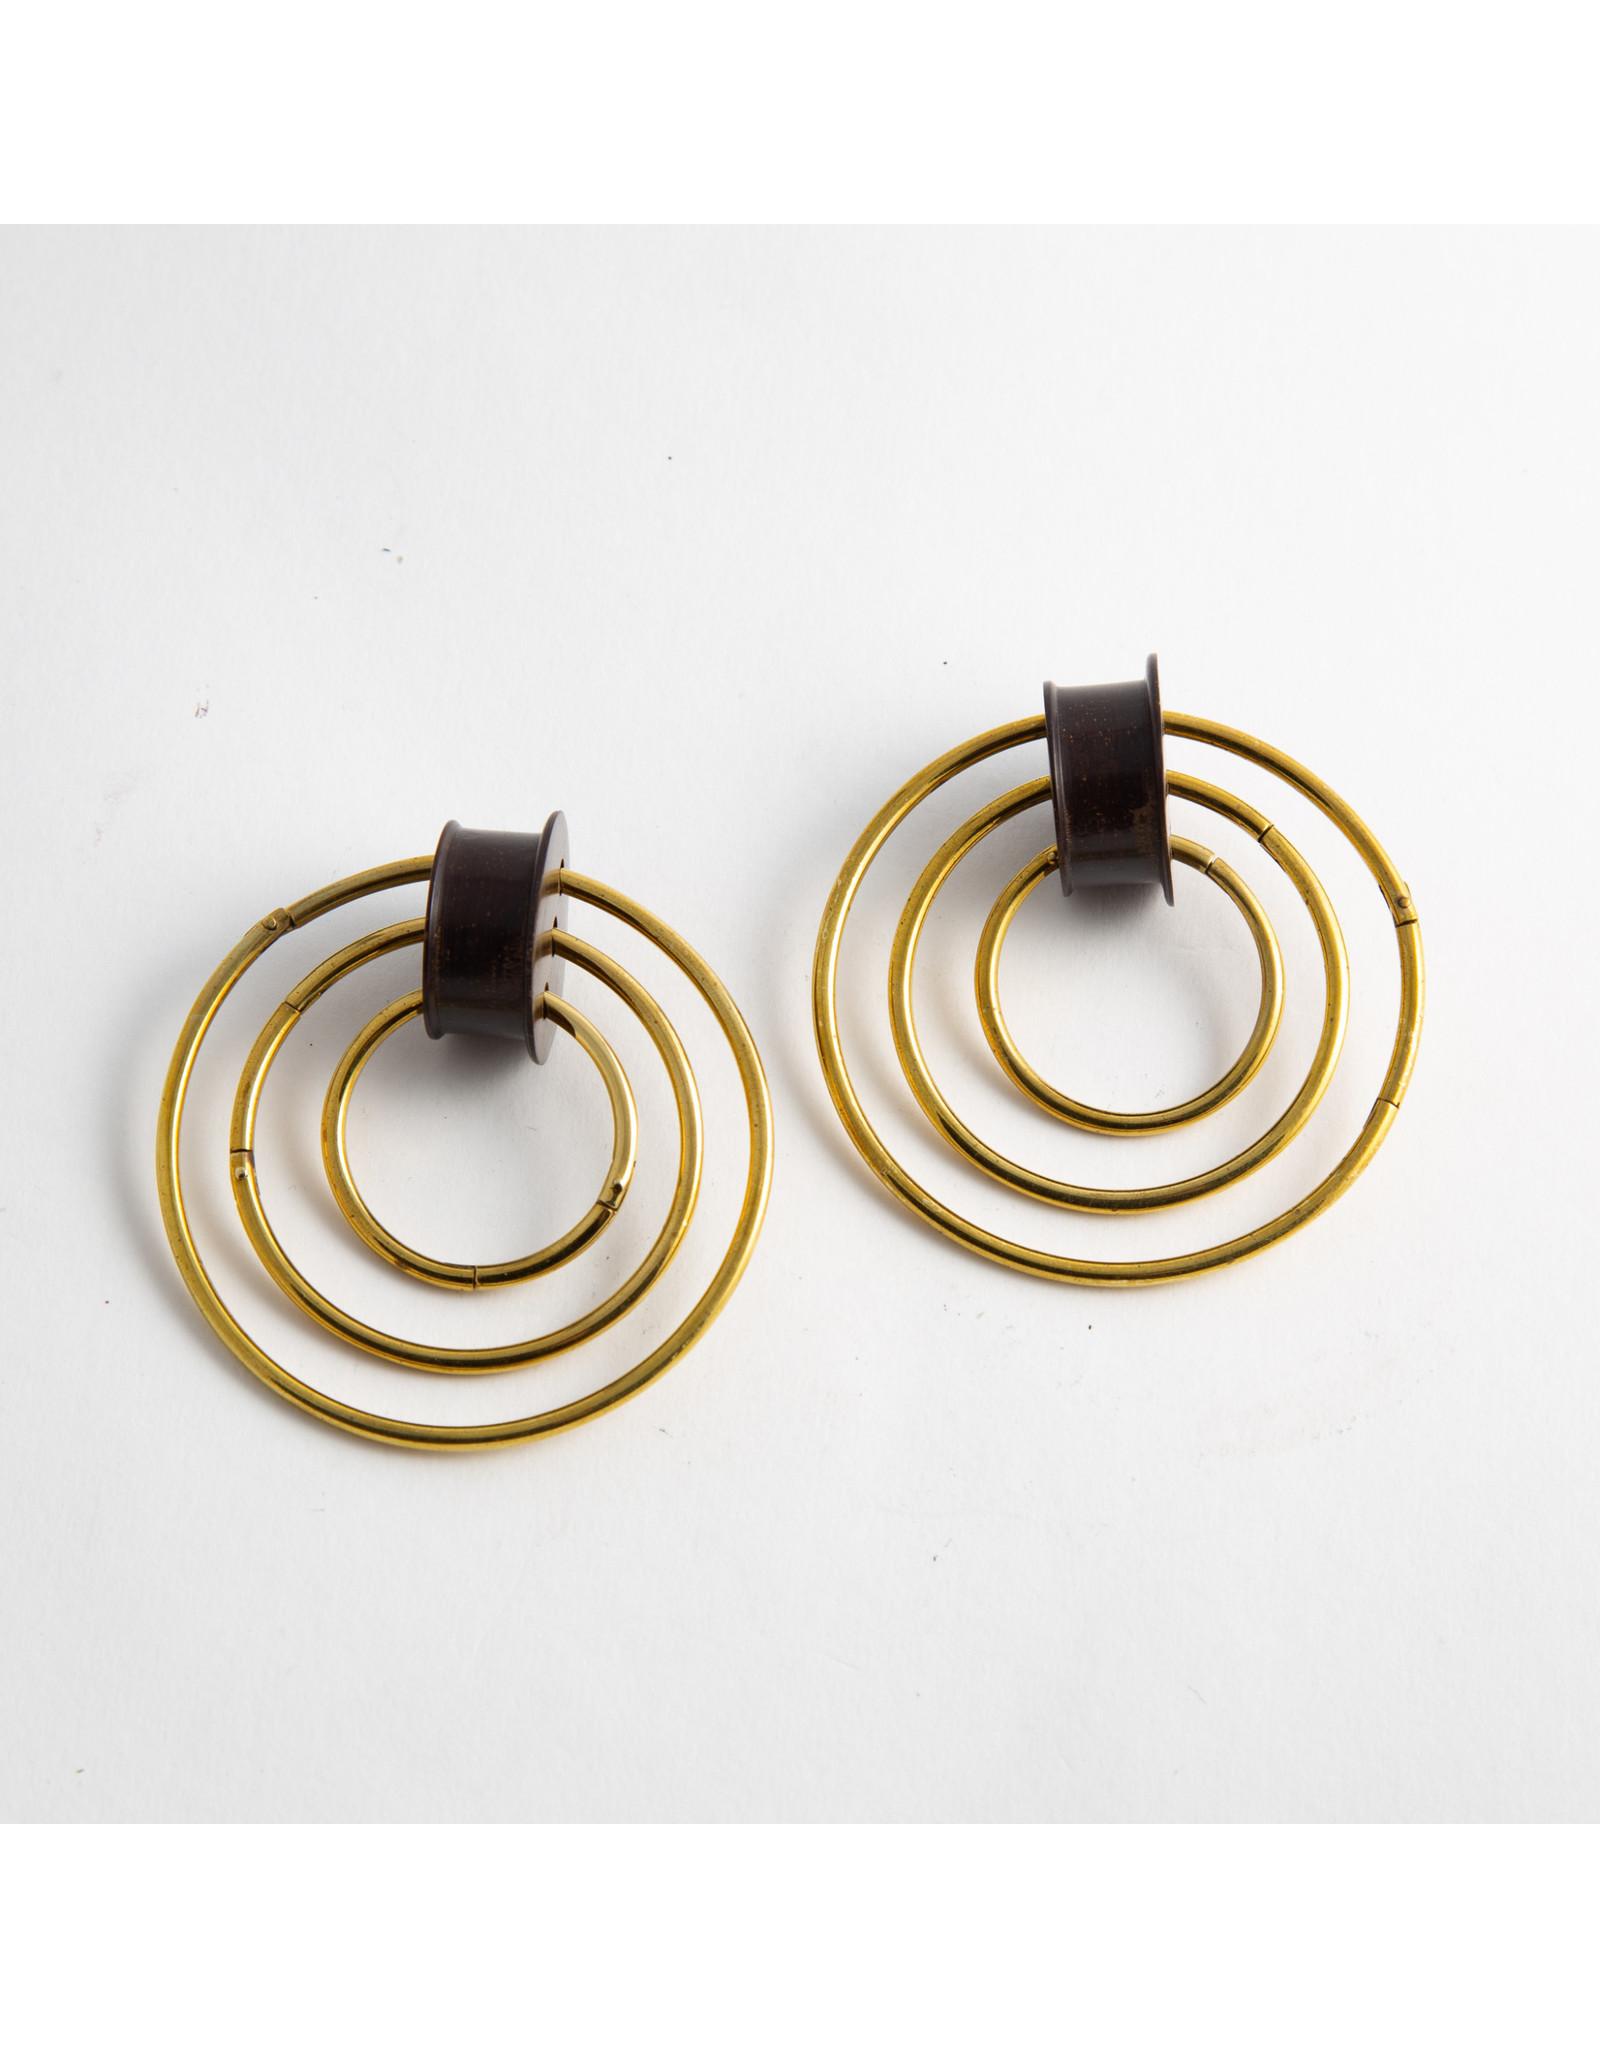 Quetzalli jewelry Quetzalli 1/2 ebony & brass 3 hoop double flared plugs